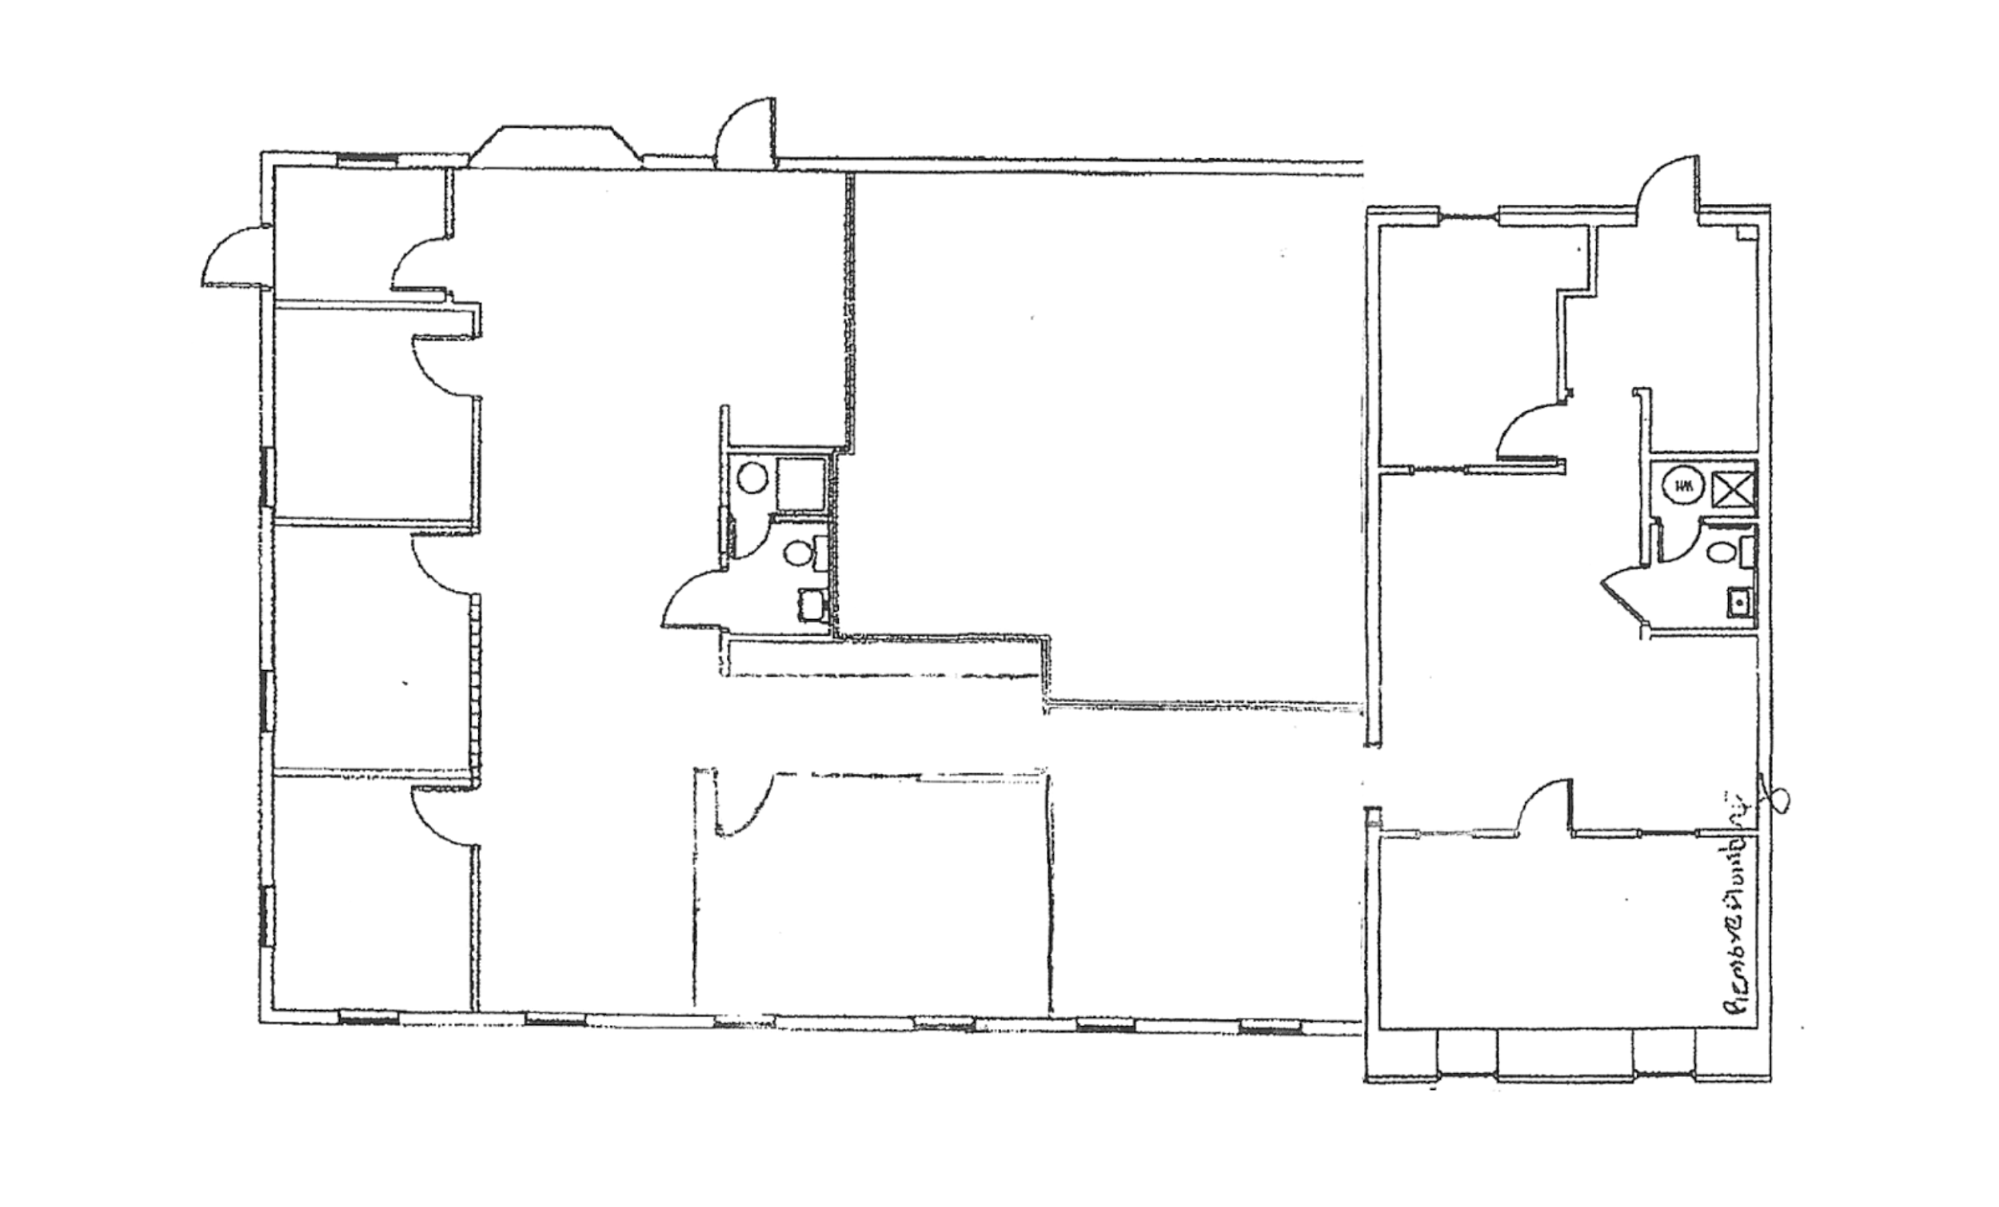 Site Planning - A 4-Tier Hierarchy - Areas